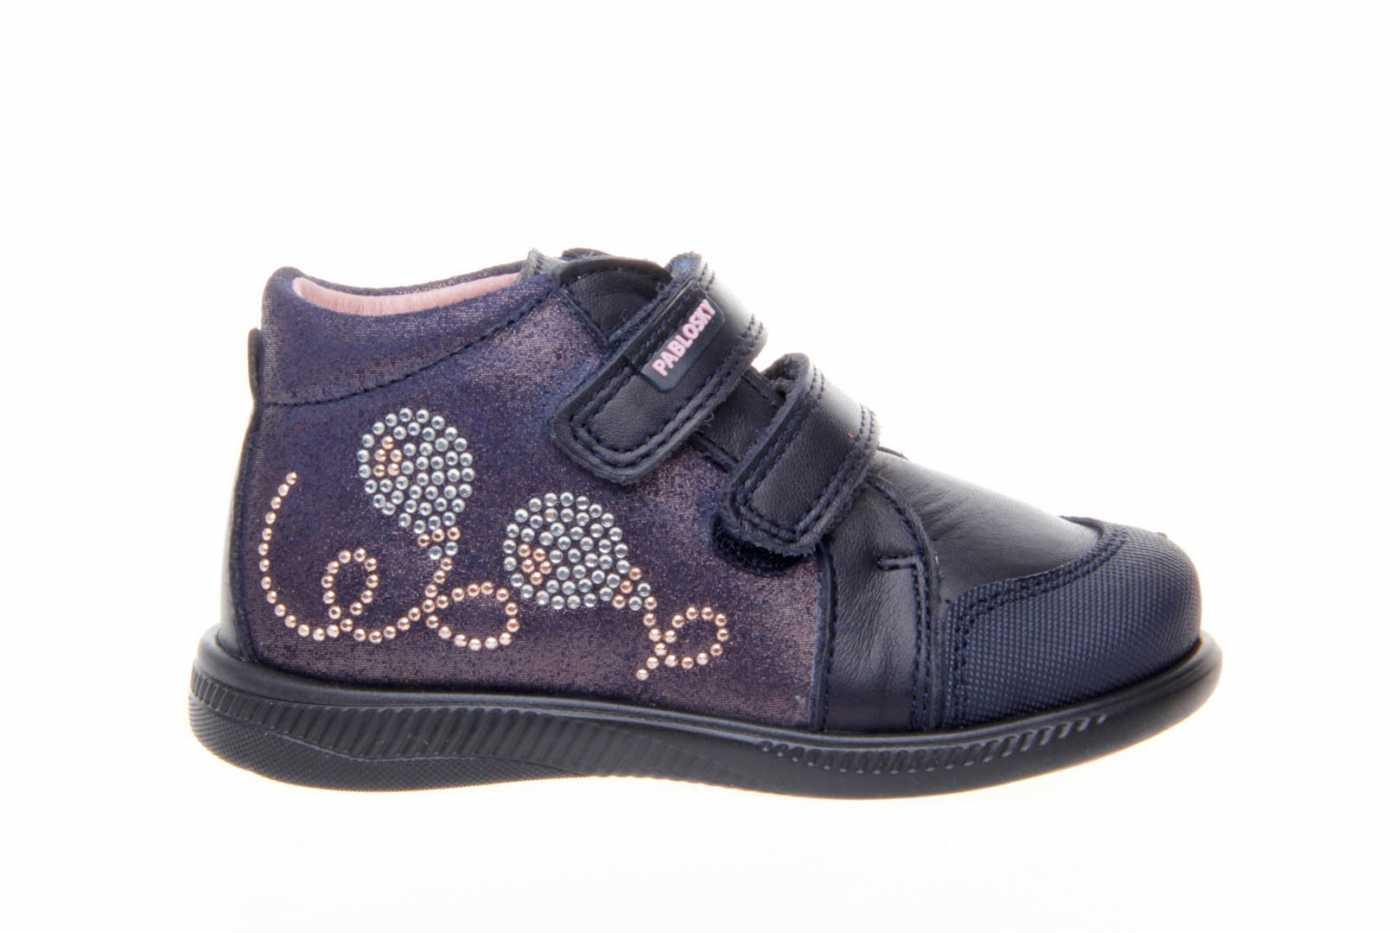 8bdd1f33 Comprar zapato tipo JOVEN NIÑA estilo BOTAS COLOR AZUL MARINO PIEL ...